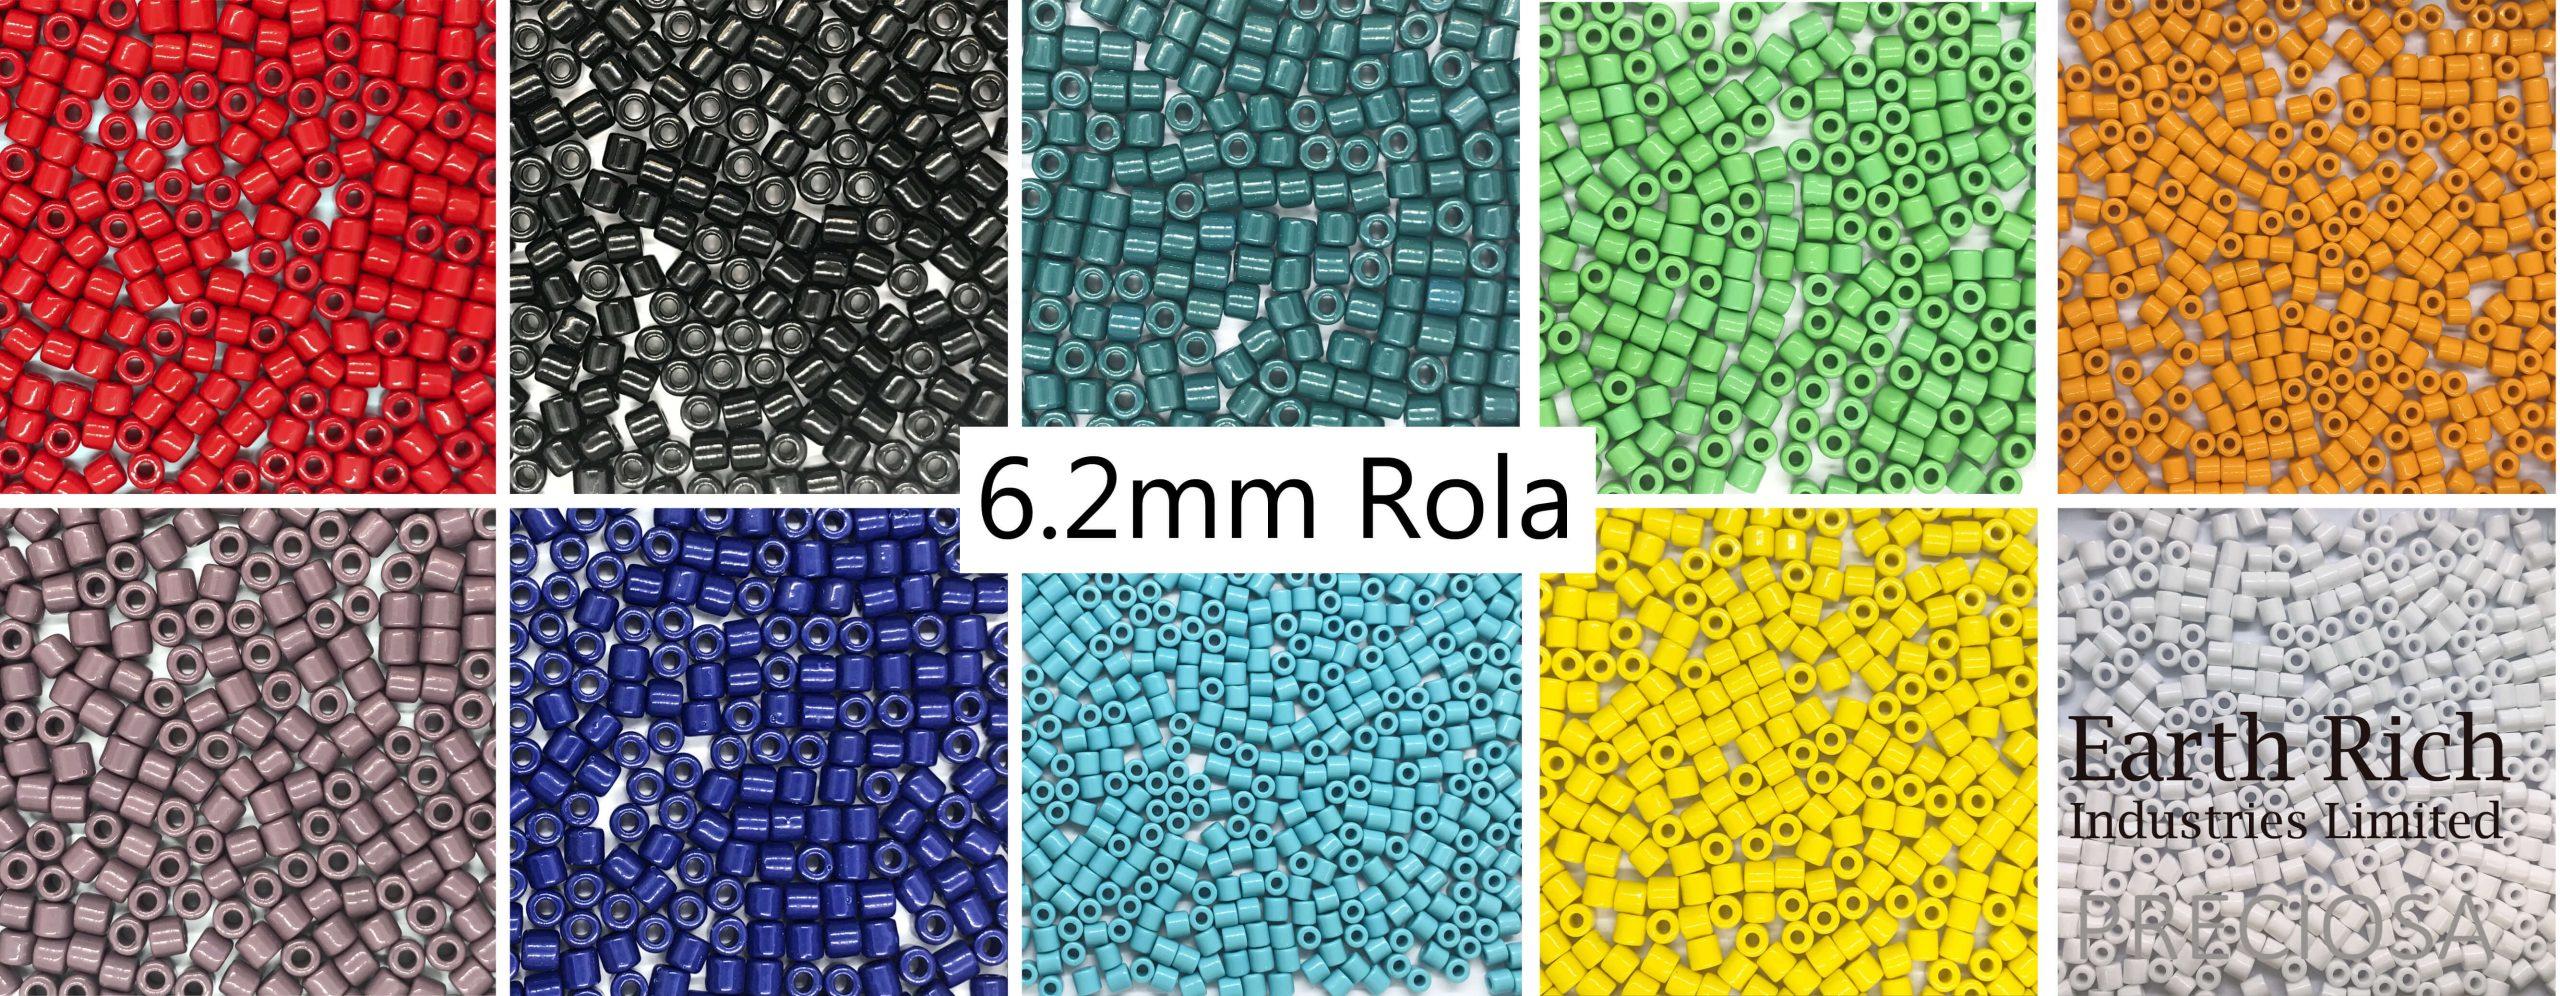 6.2mm rola 10 colors banner